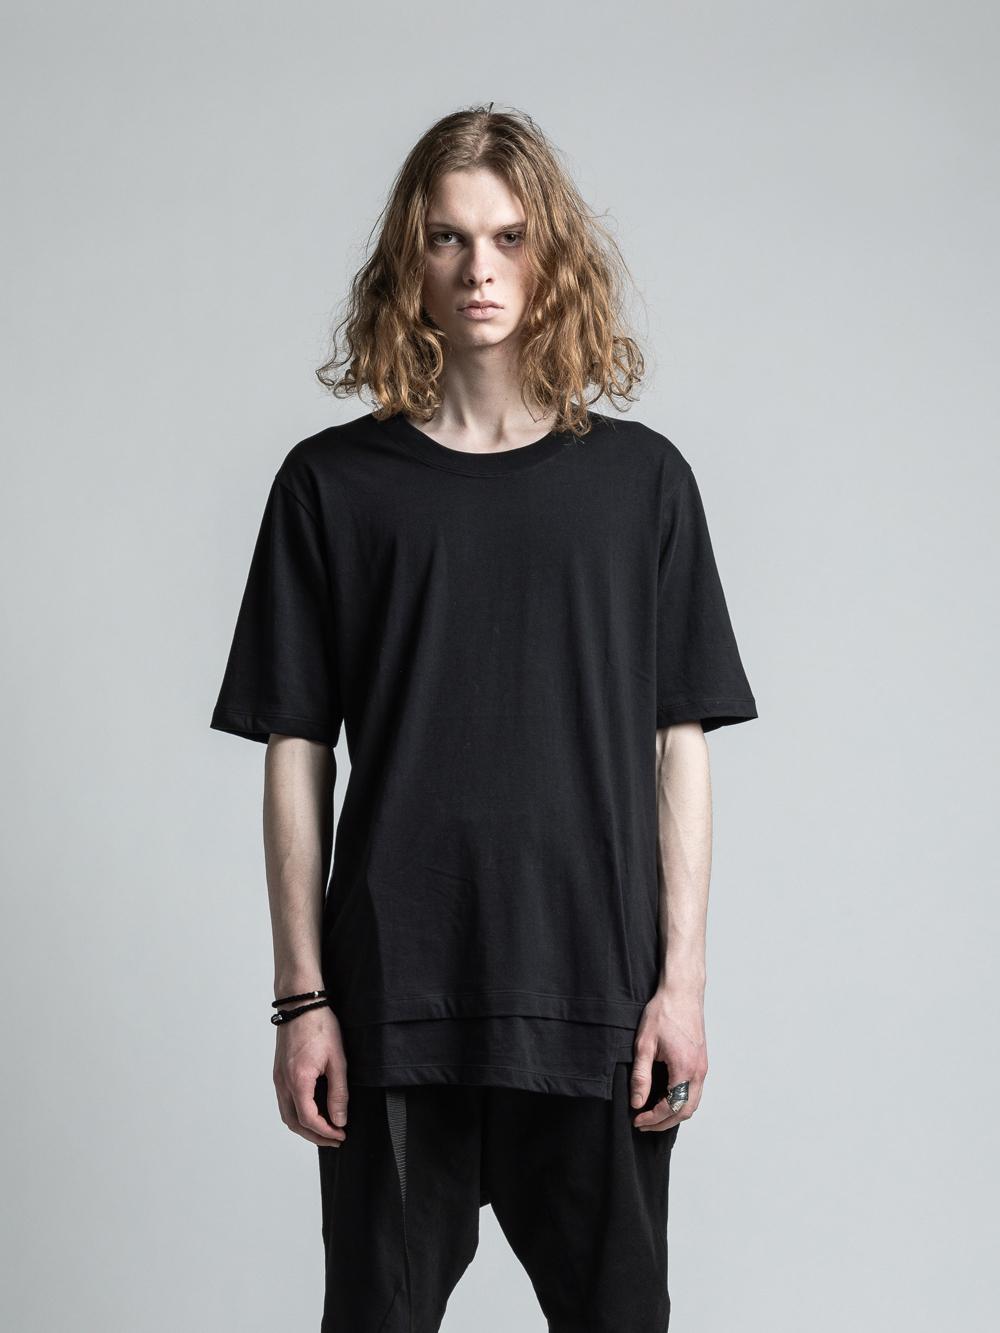 VI-3229-01 / コーデュラナイロン切り替えTシャツ